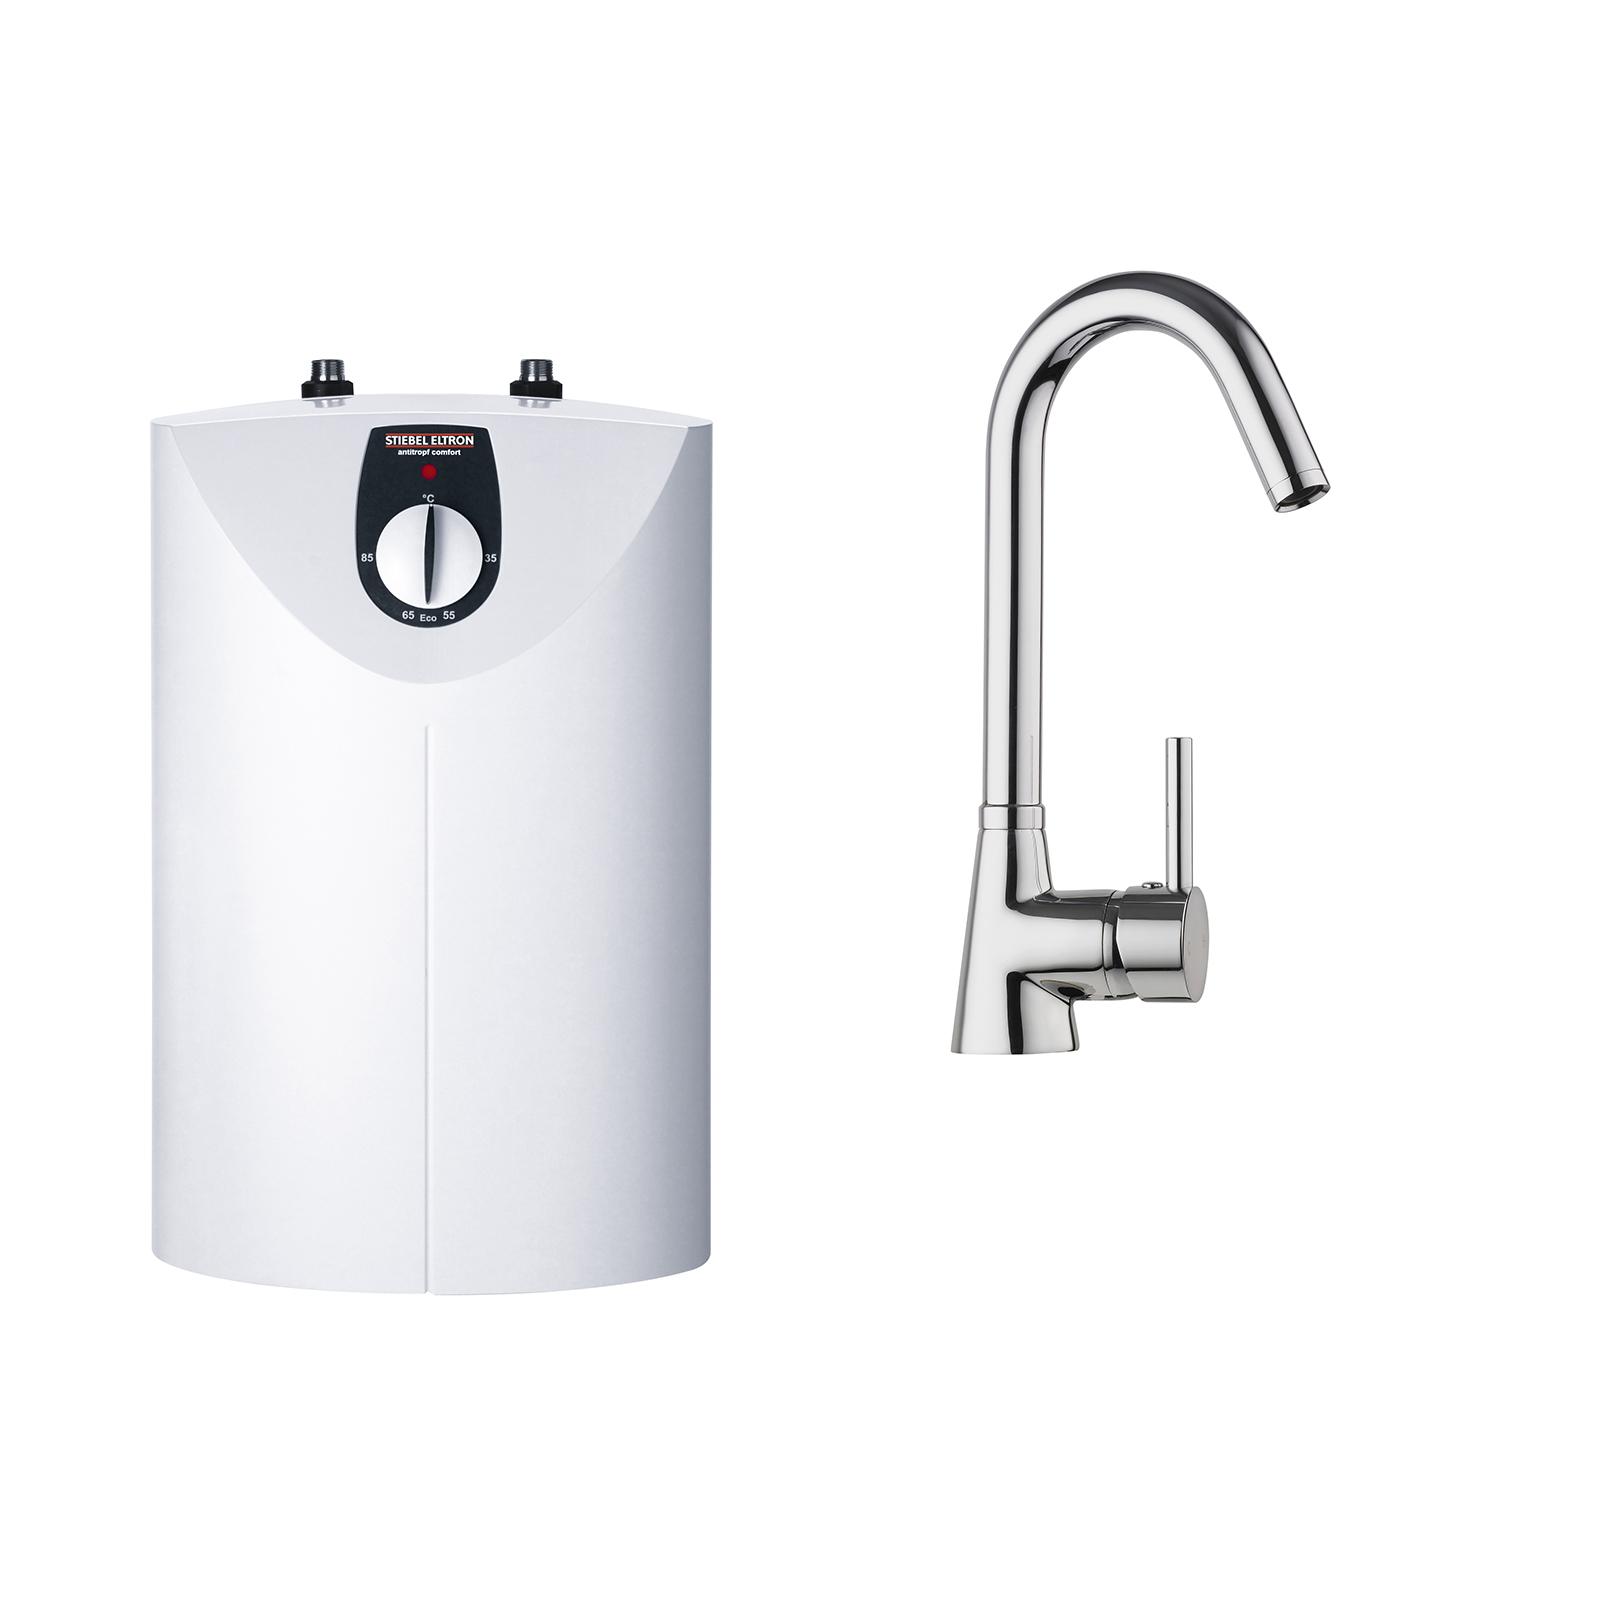 STIEBEL ELTRON SNU 5 Open Vented Water Heater With MES-G Gooseneck Tap